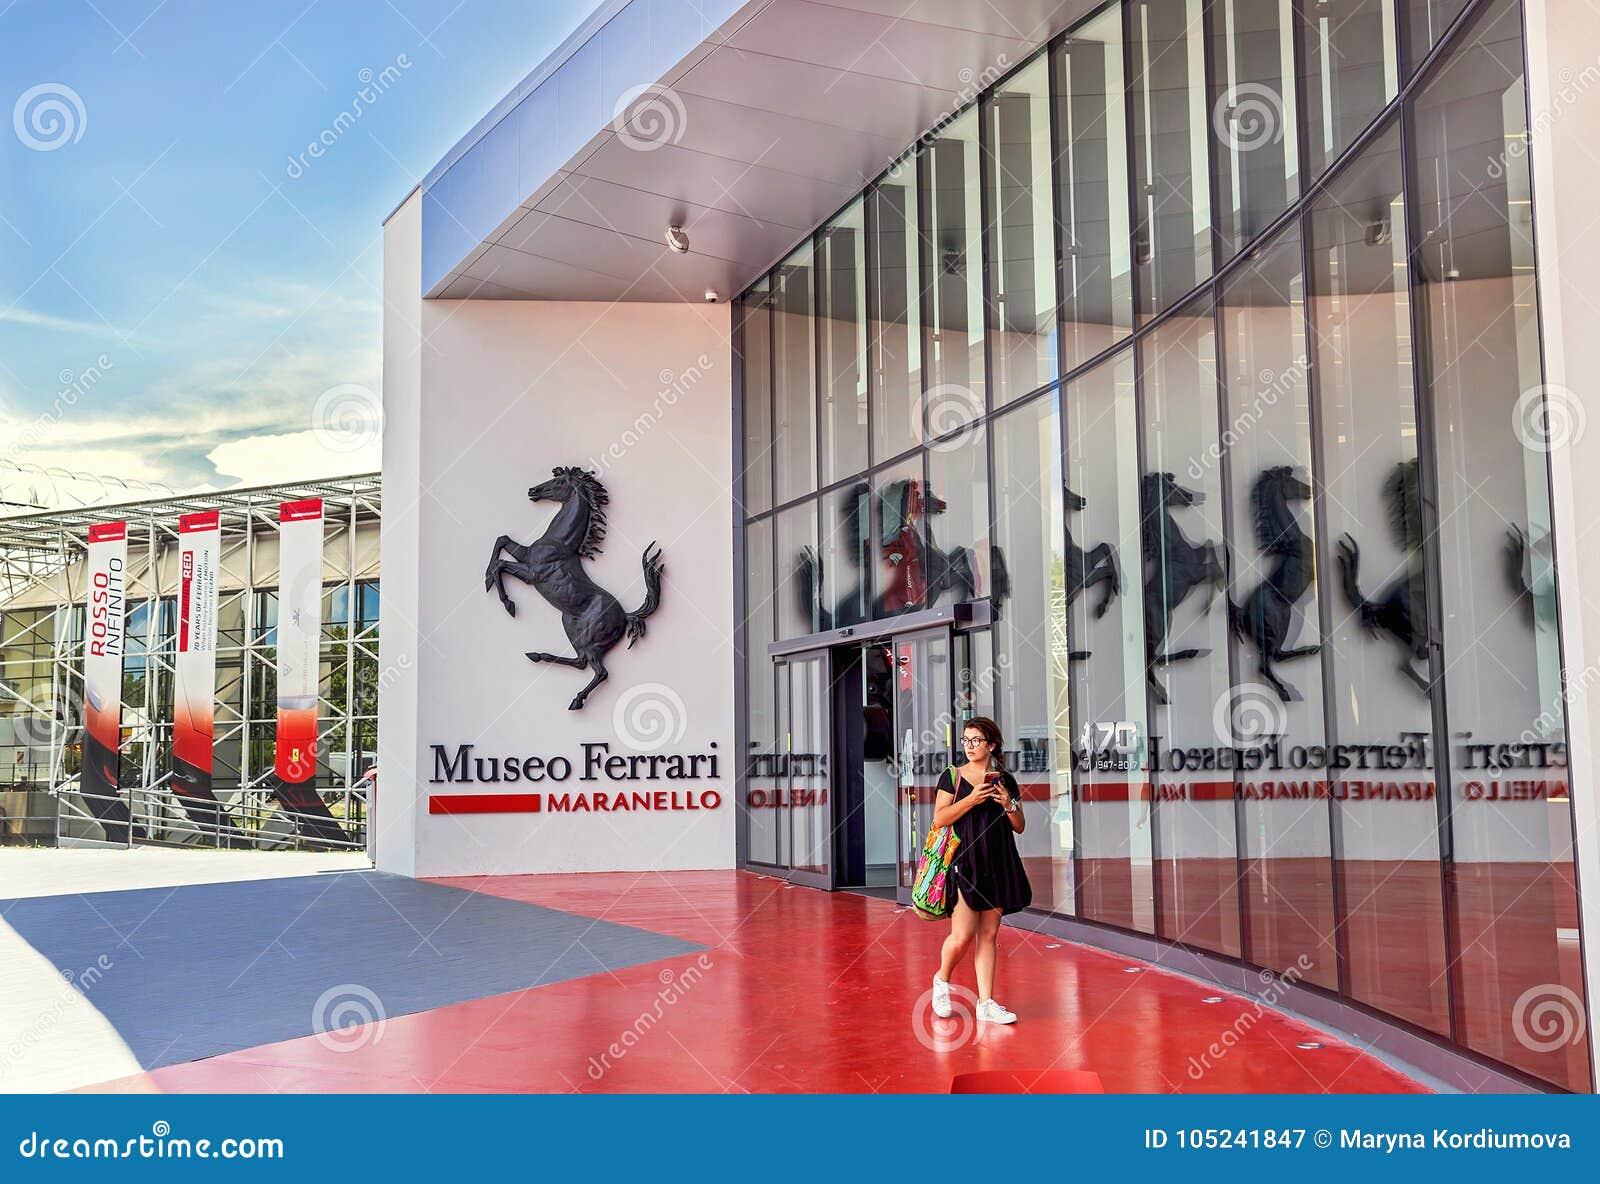 Maranello, Italy – July 26, 2017: Girl near main entrance to famous, popular Ferrari museum (Enzo Ferrari).